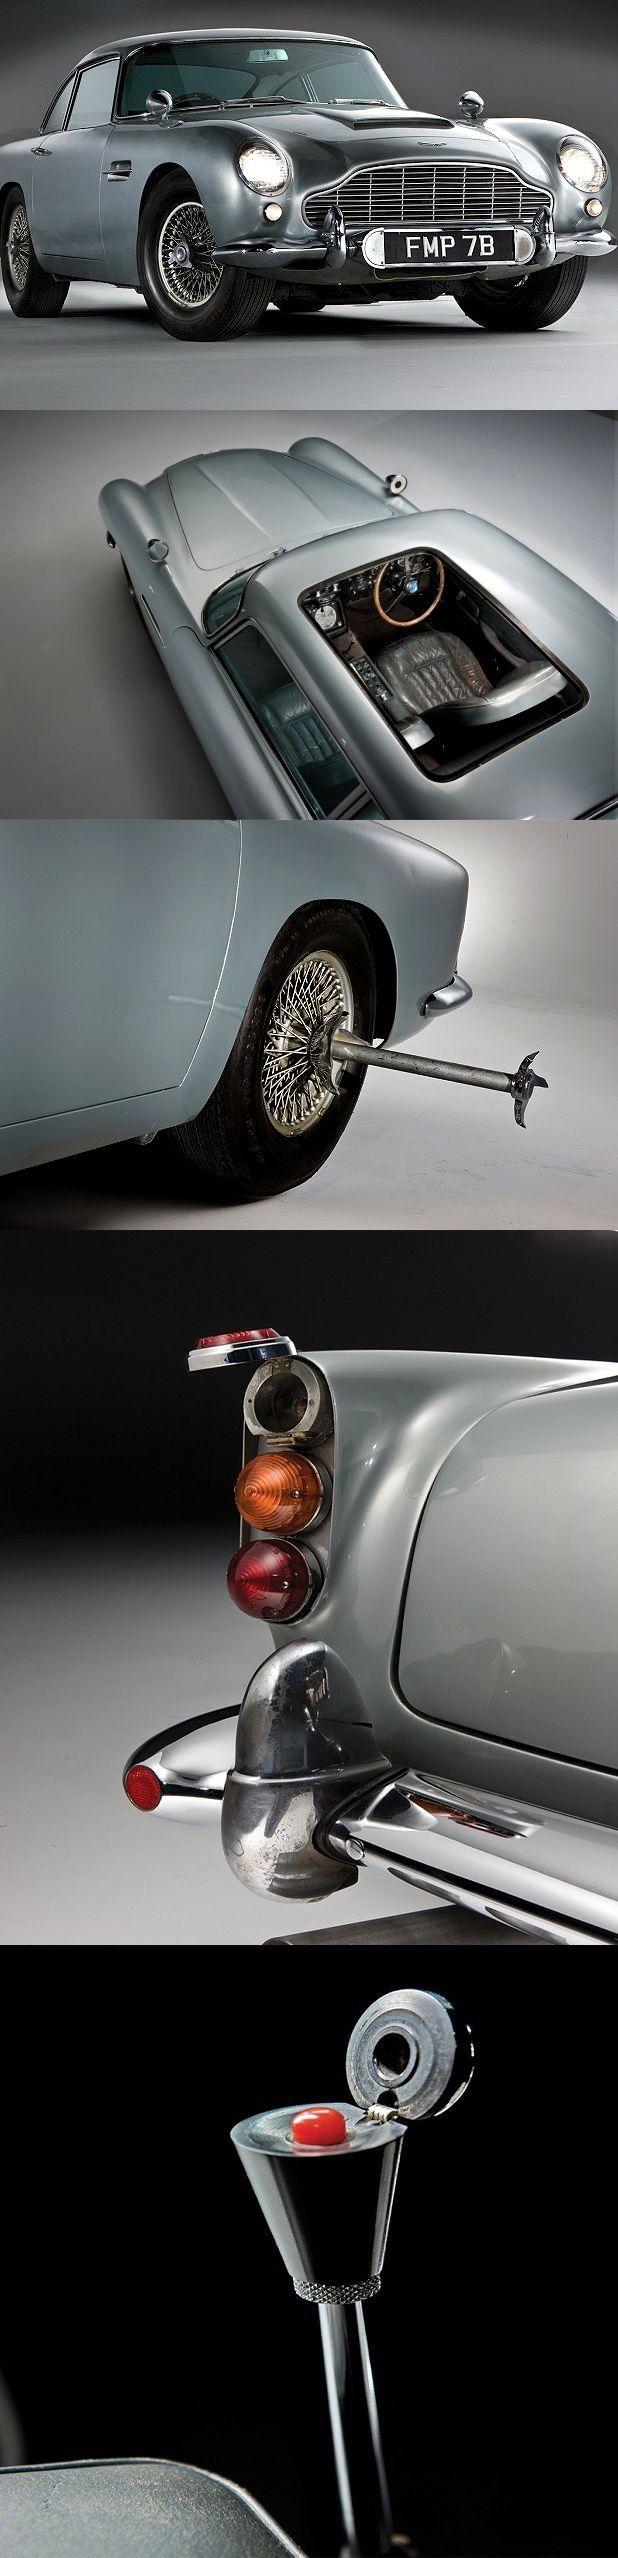 James Bond's Original '007′ Aston Martin DB5